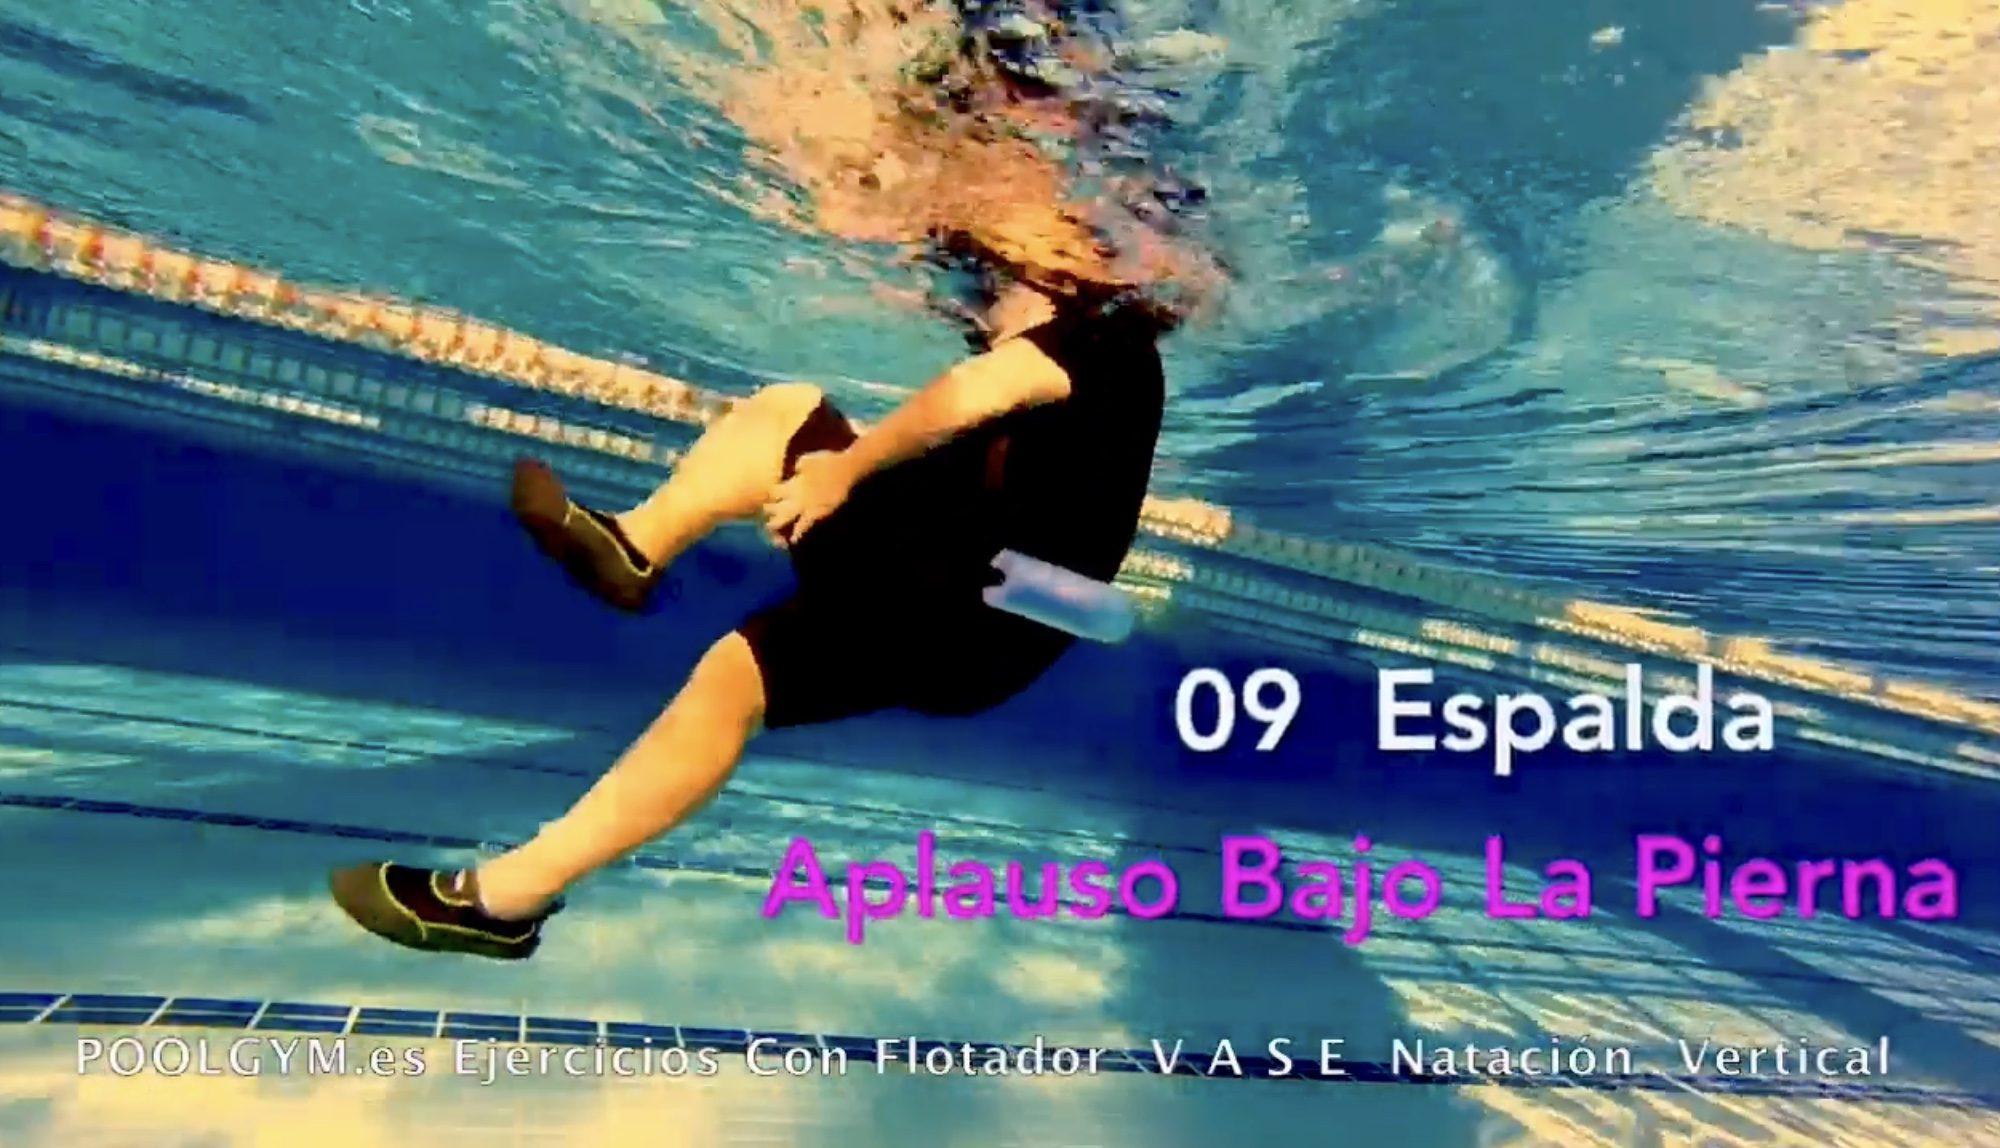 09 APLAUSO BAJO LA PIERNA Espada poolgym